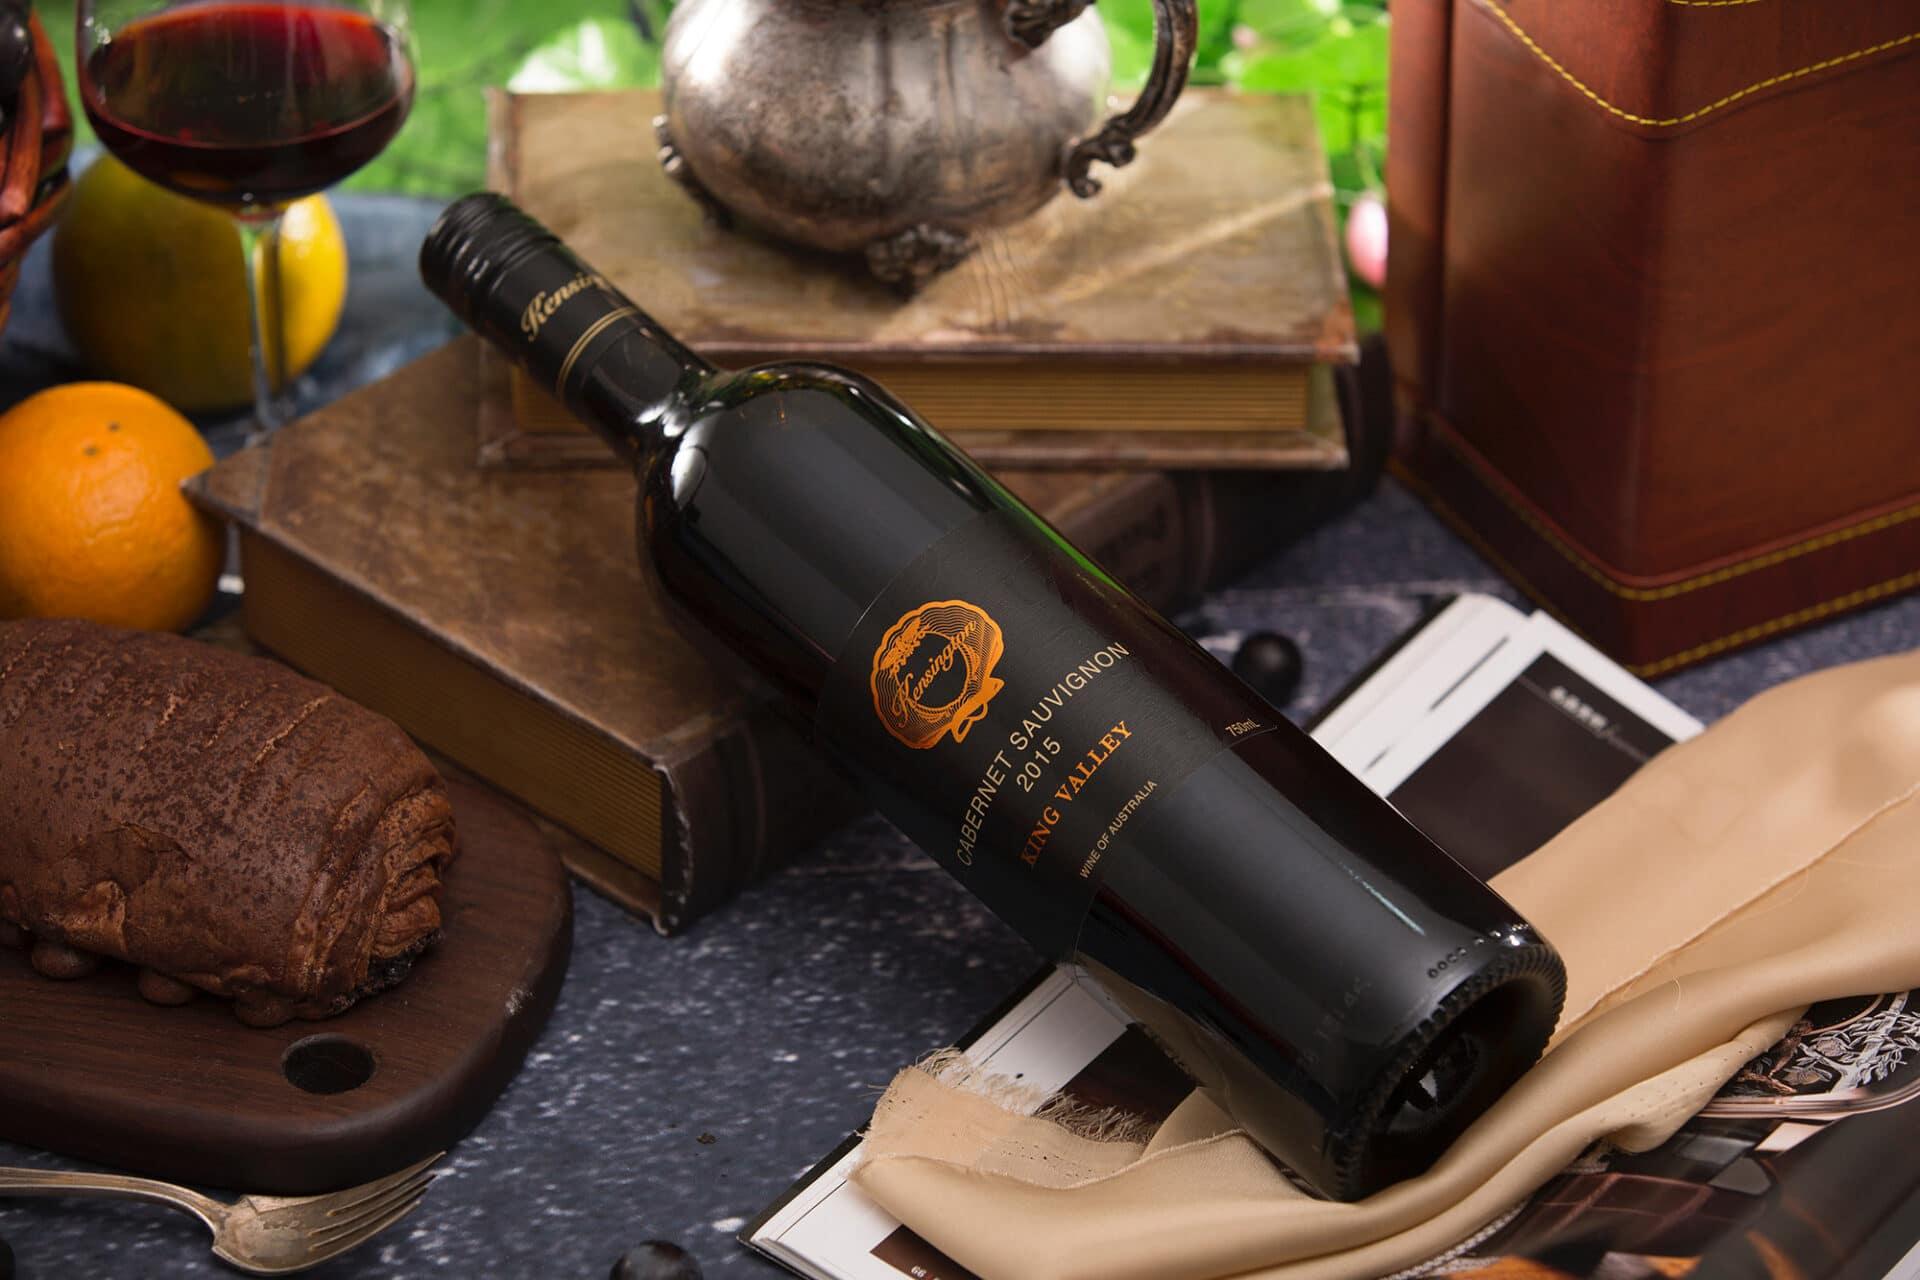 kathy-lee-oeno passion grossiste vin haut de gamme bretagne